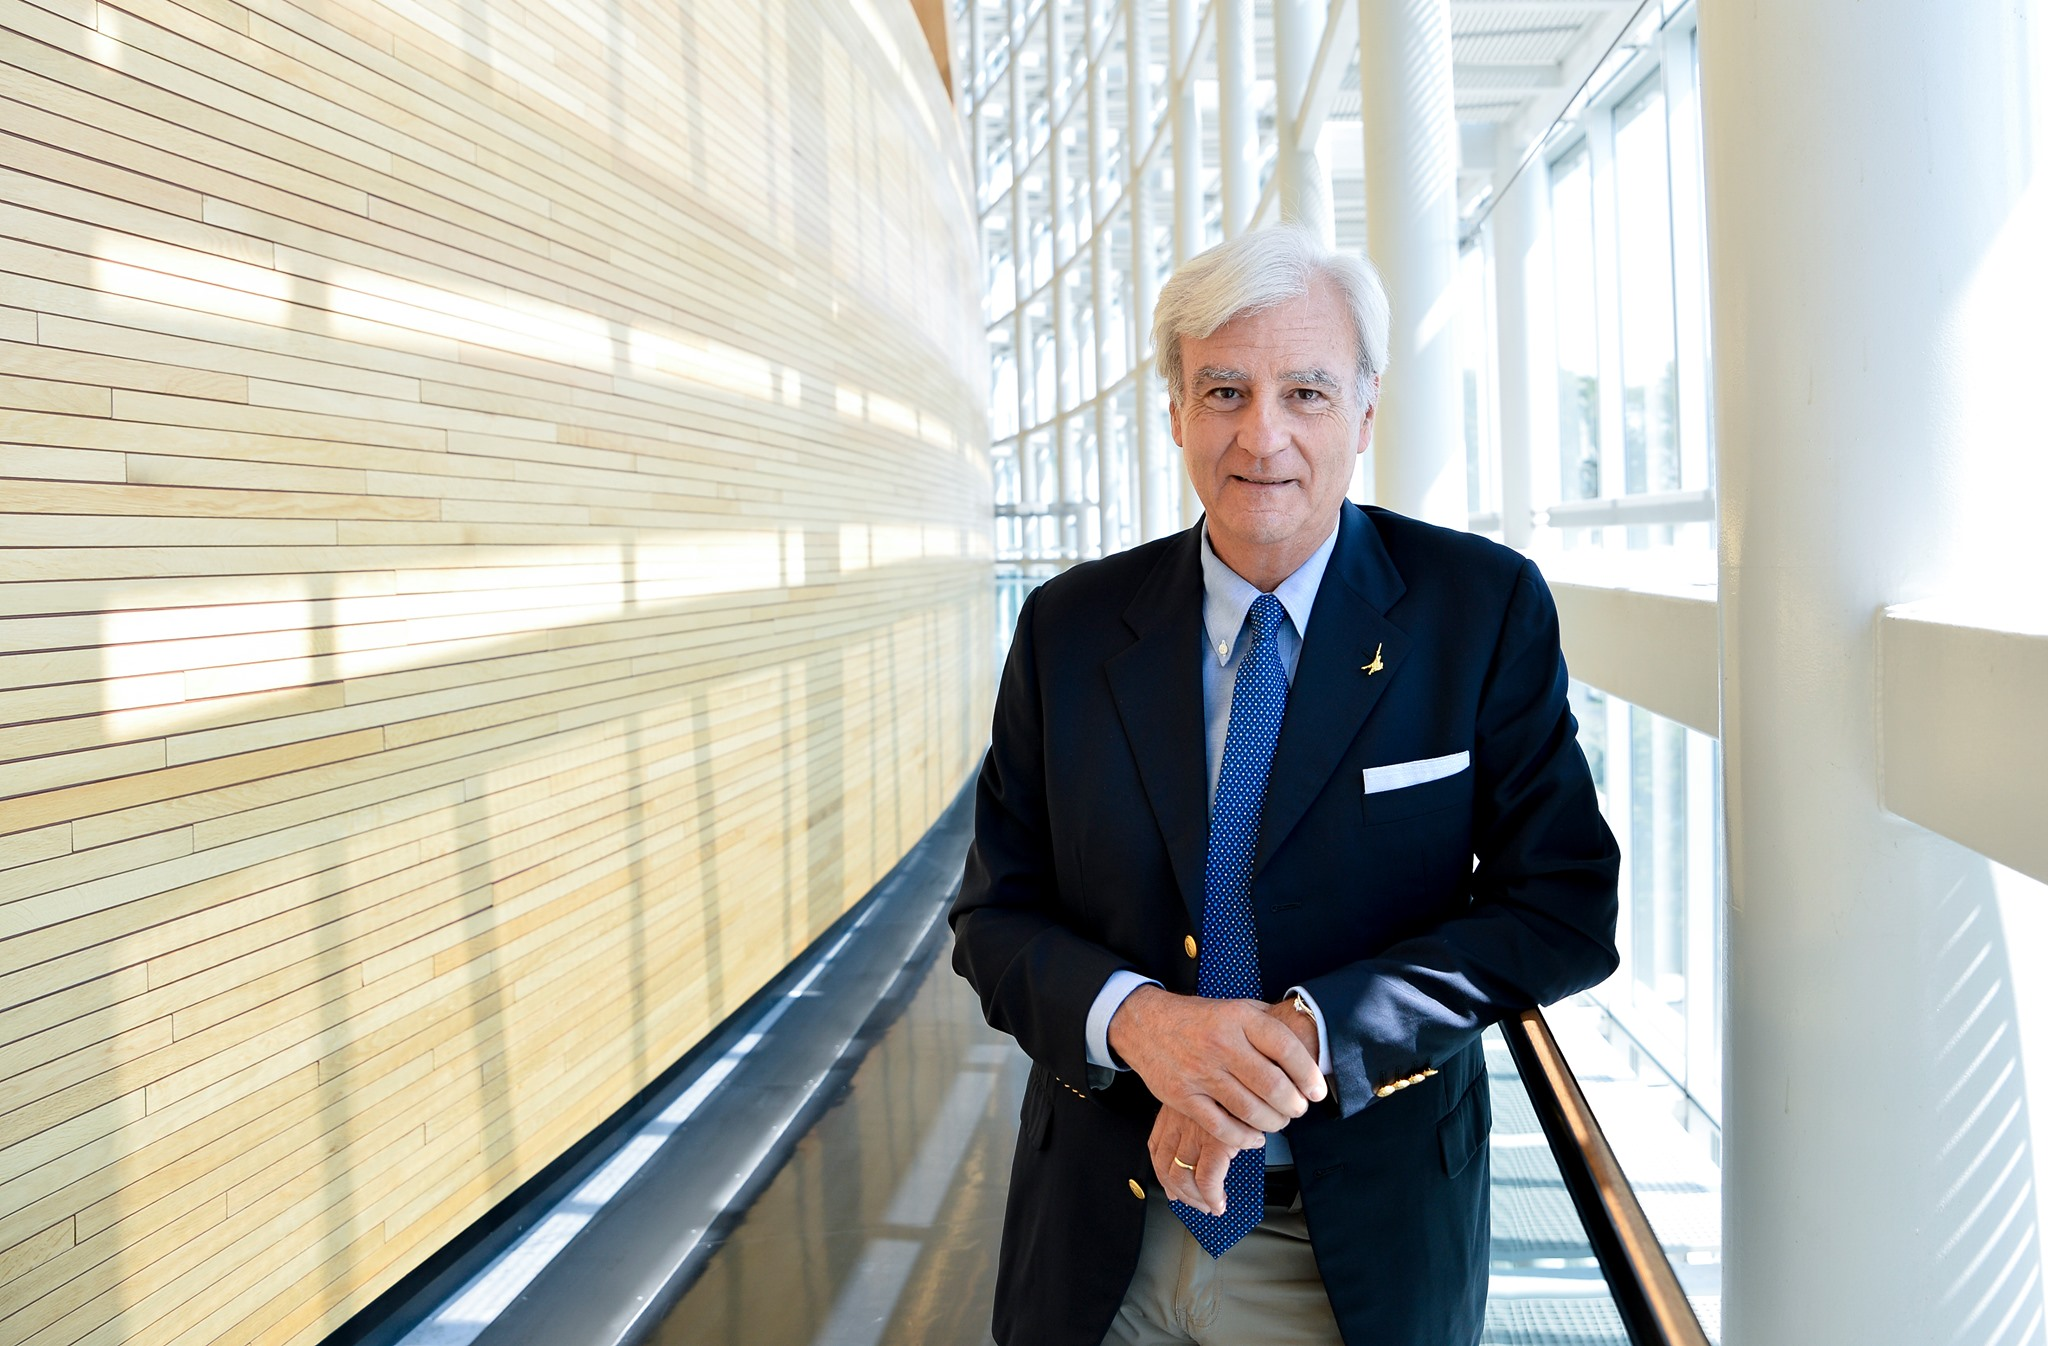 Intervista TP Antonio Rinaldi